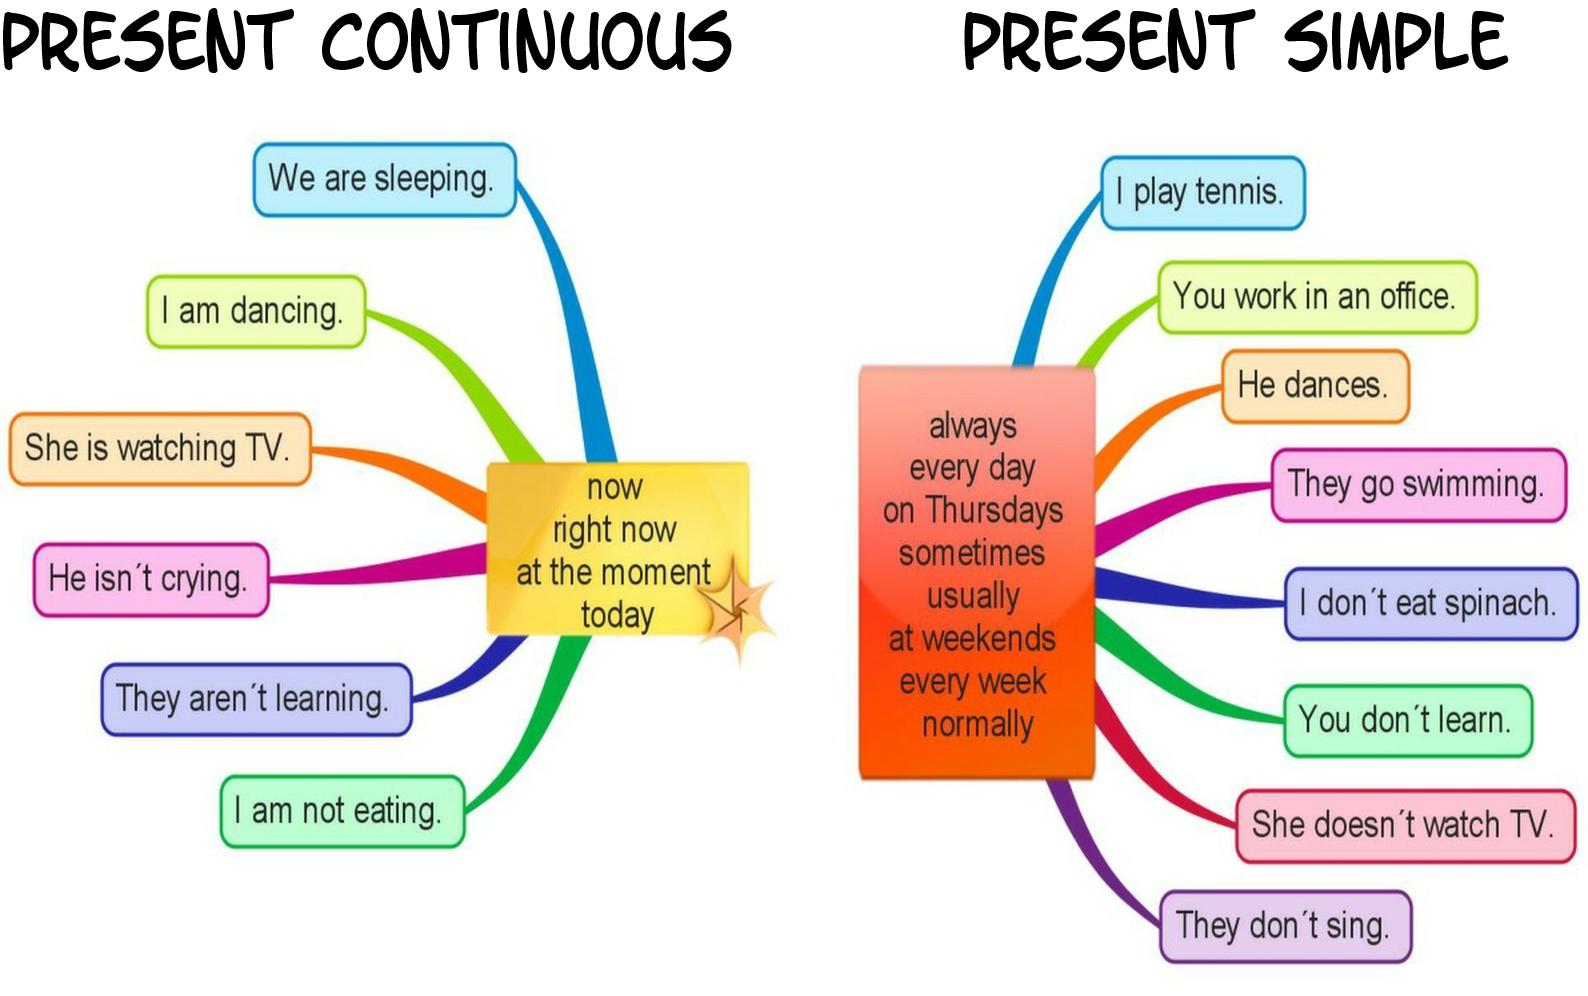 Present simple or continuous vysvětlení